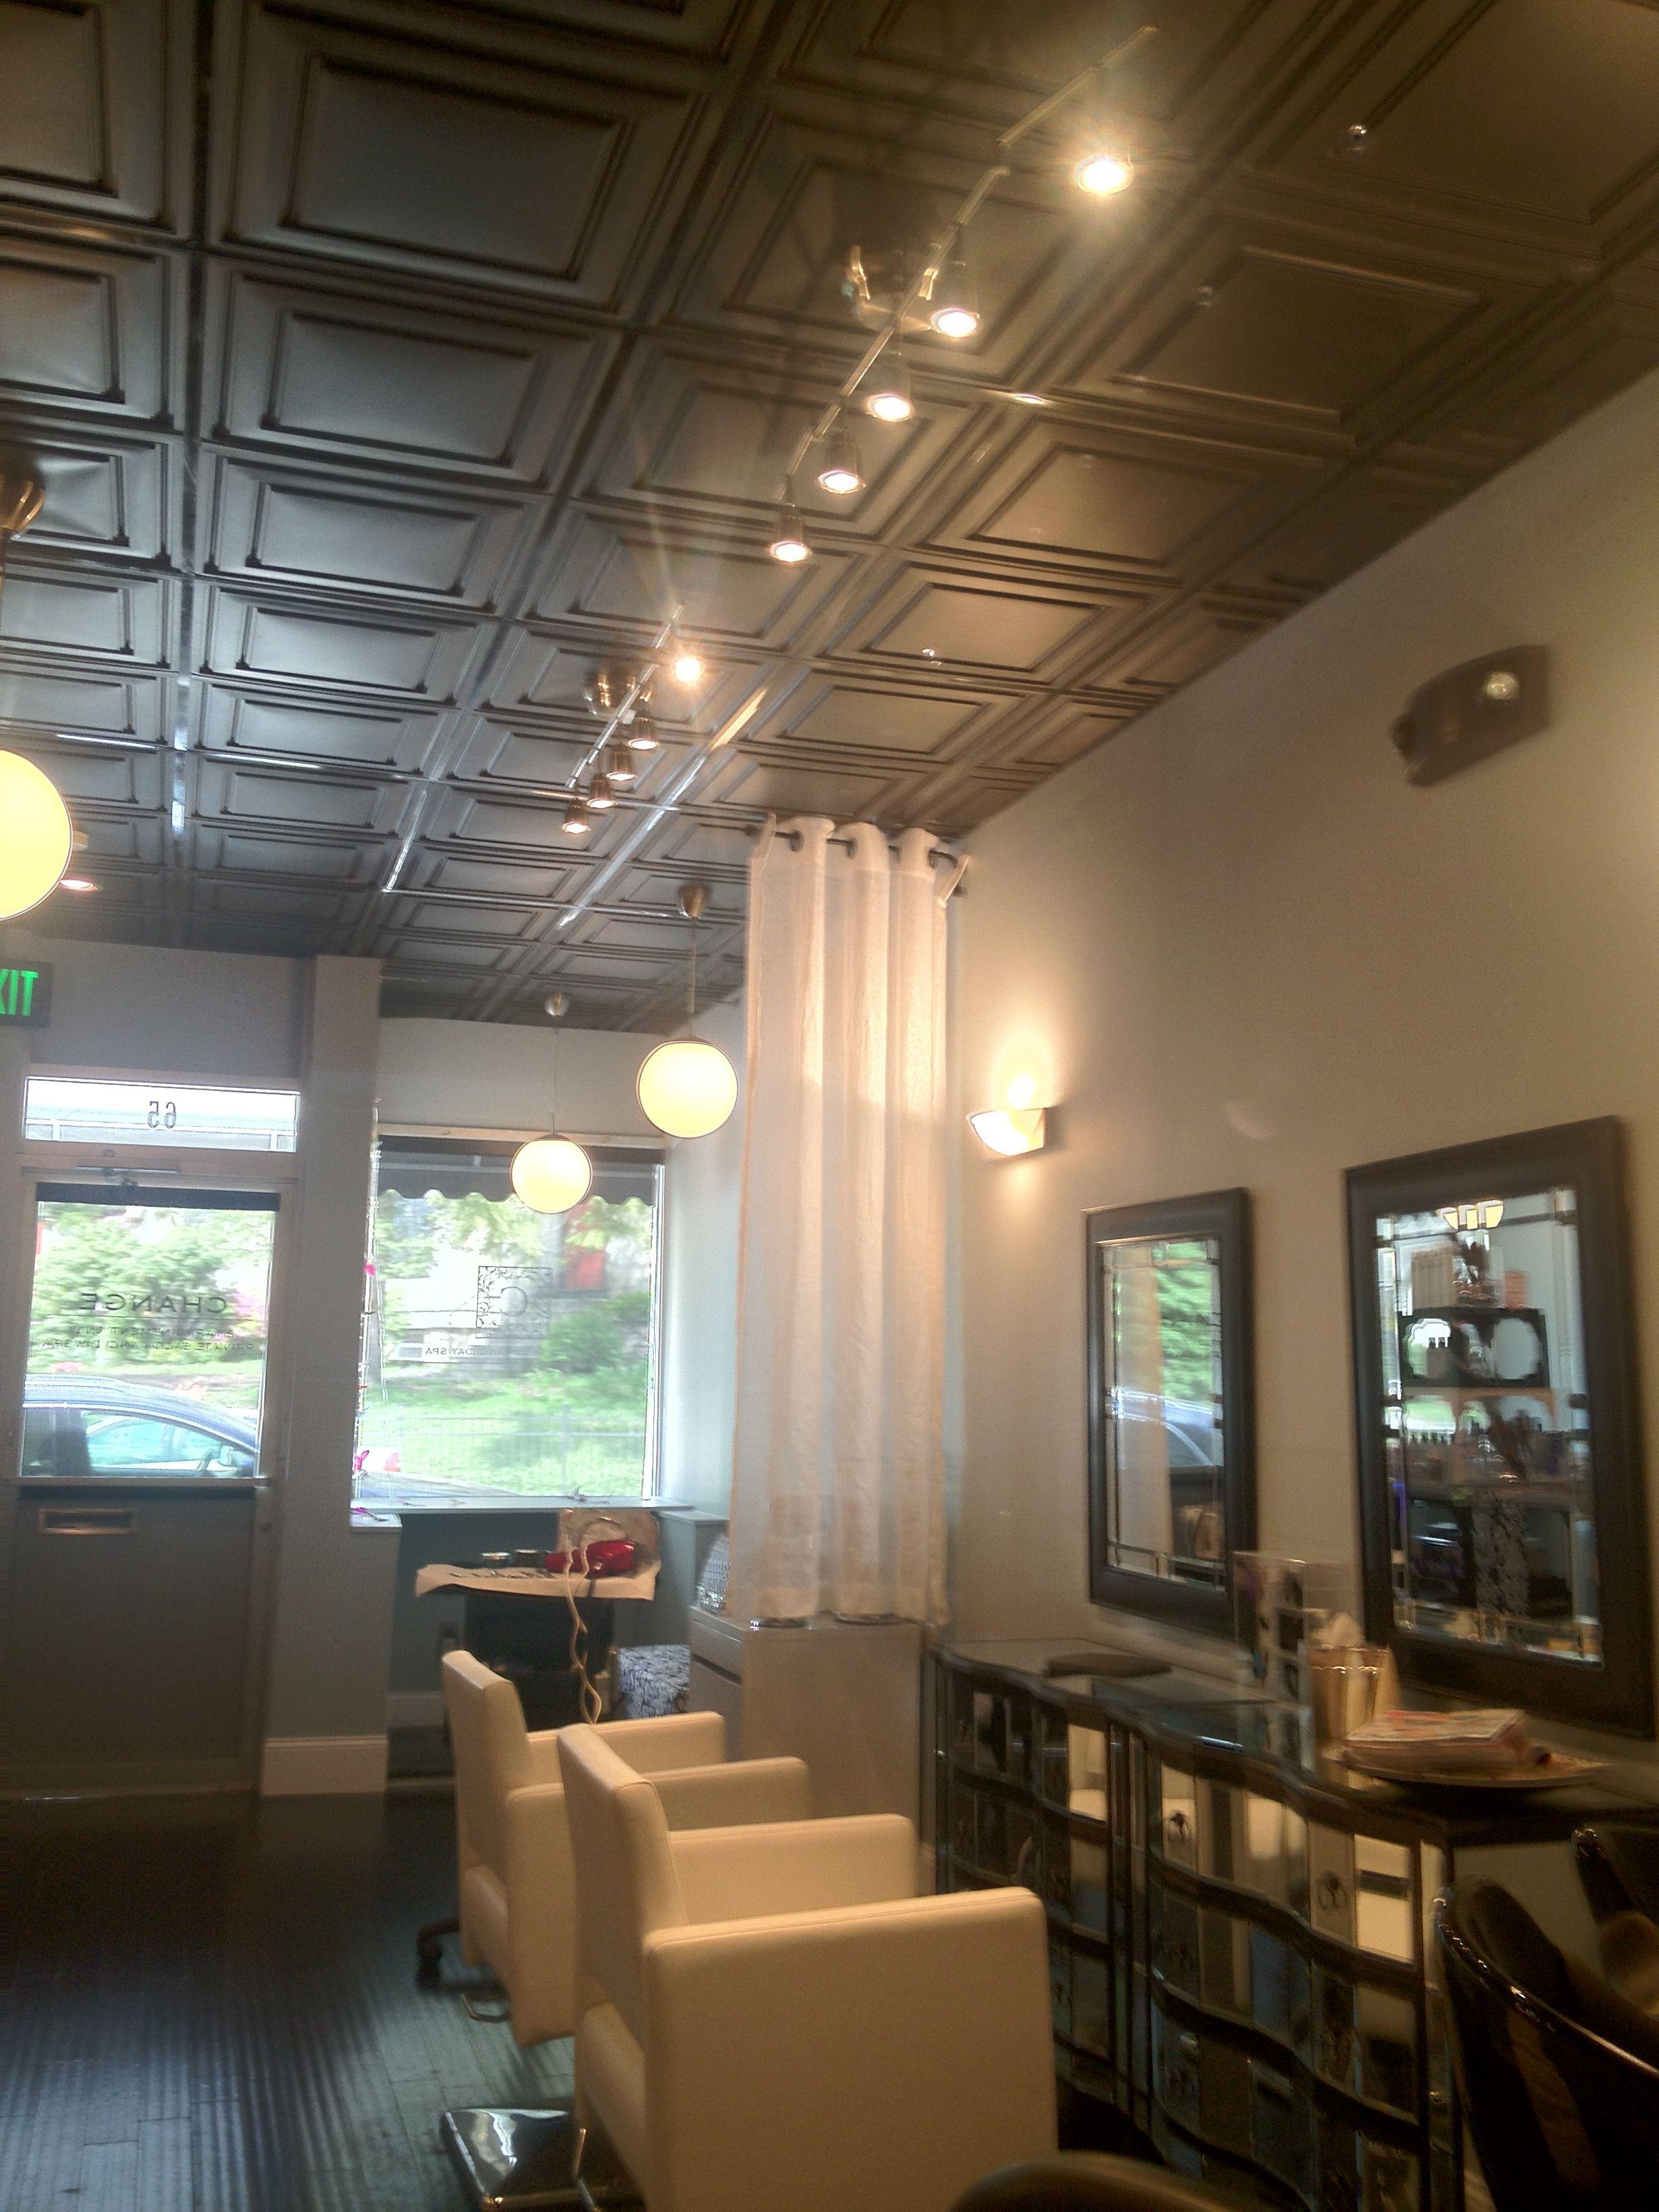 Salon Design By C Harding Callahan Ceiling Tiles Painted